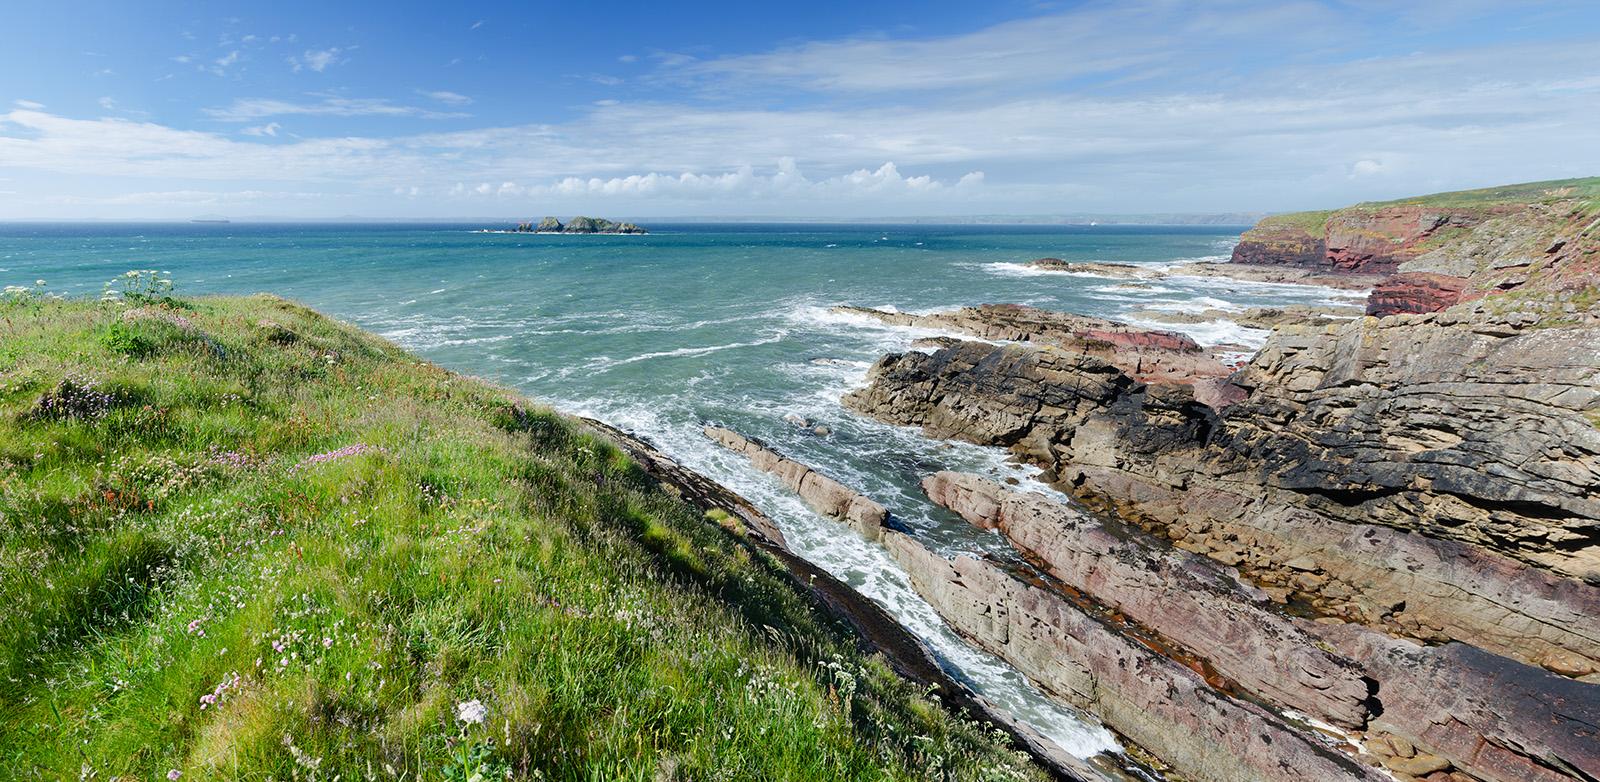 druidstone_haven_marloes-panorama8-2